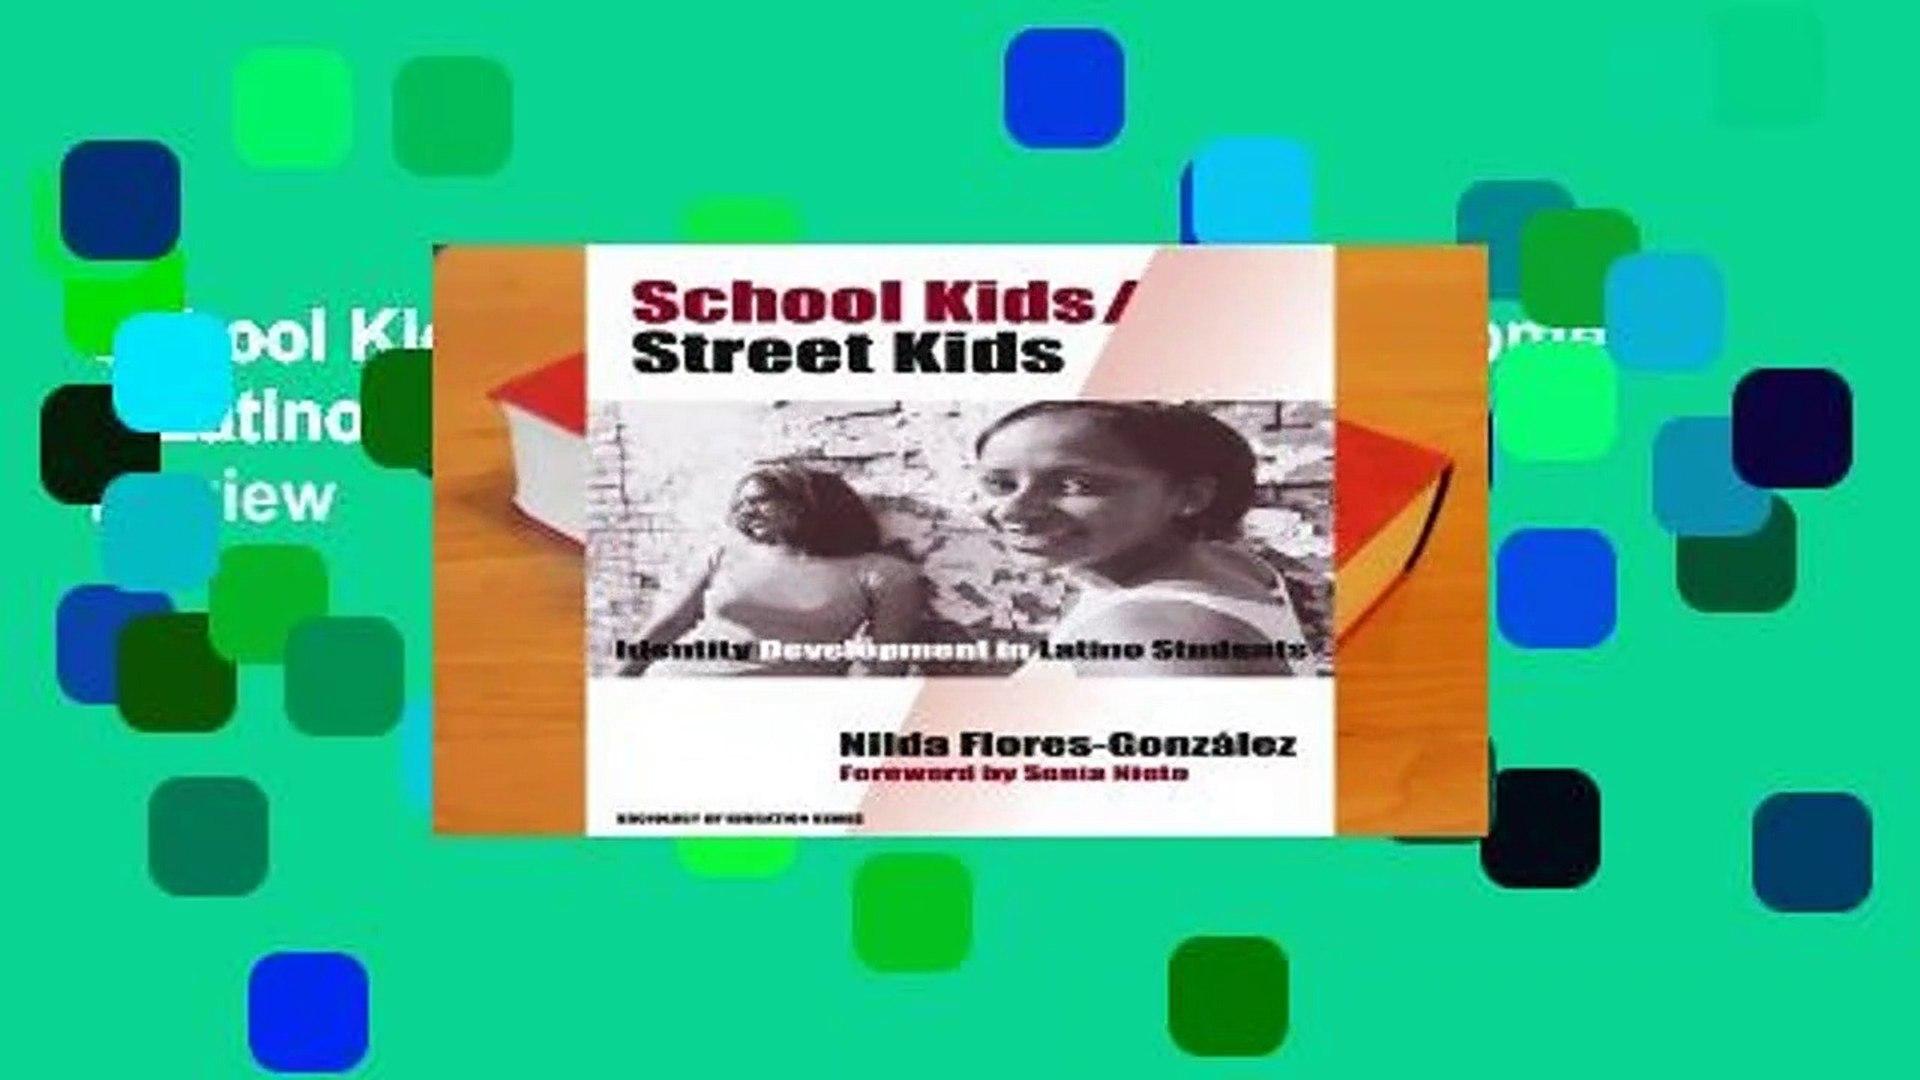 School Kids/Street Kids: Identity Development in Latino Students (Sociology of Education)  Review